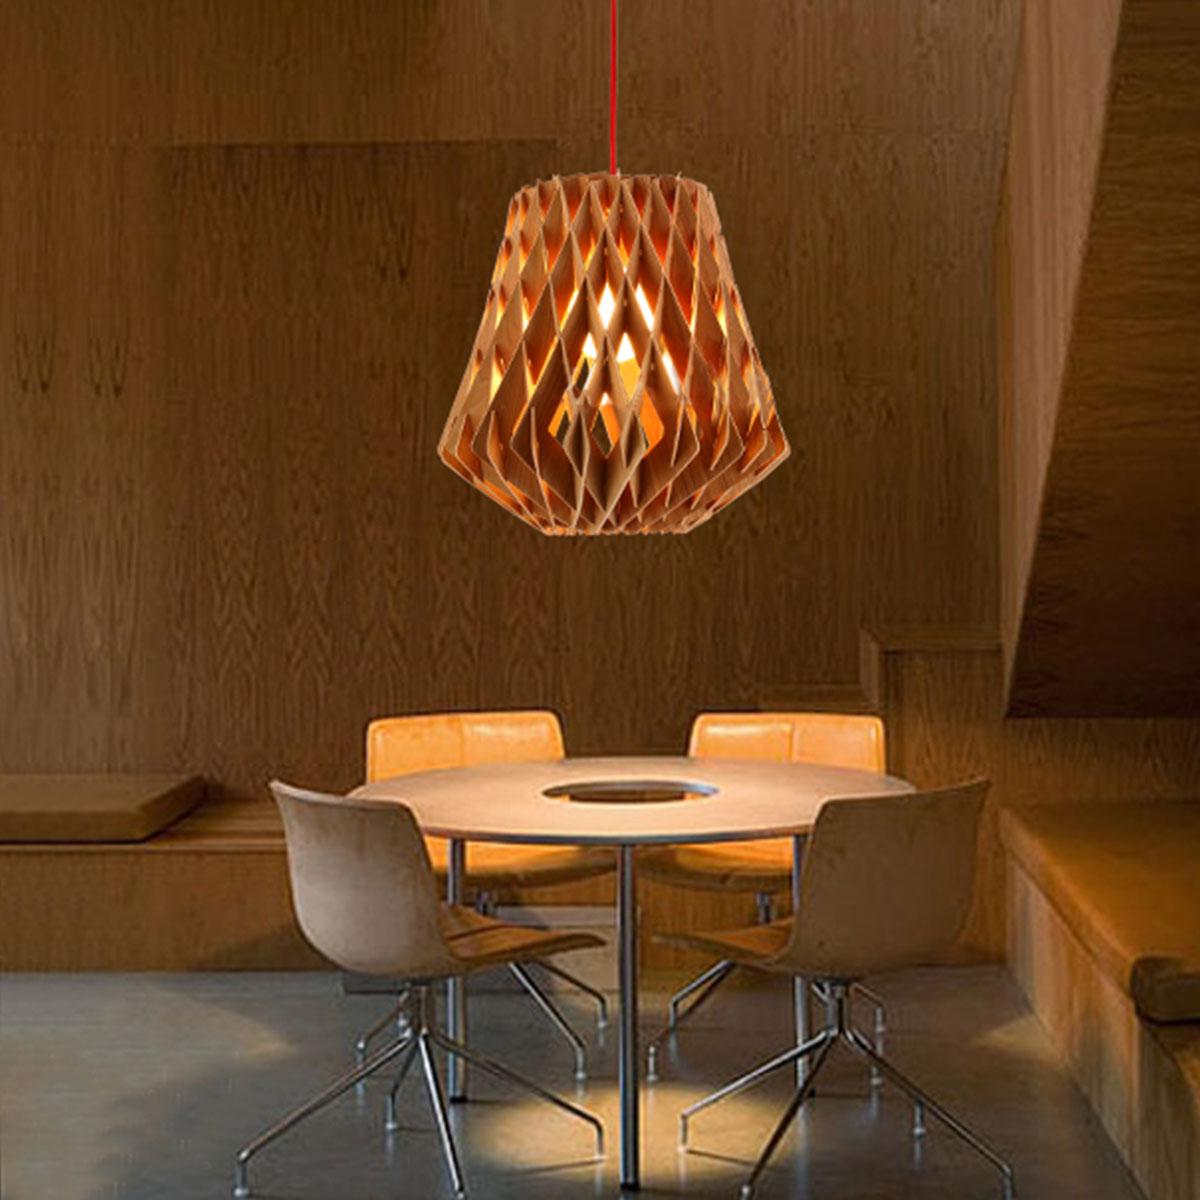 Modern Japan Style Wood Pendant Light Loft Wooden Lamp For Dining Room Home Lighting Decor In Lights From On